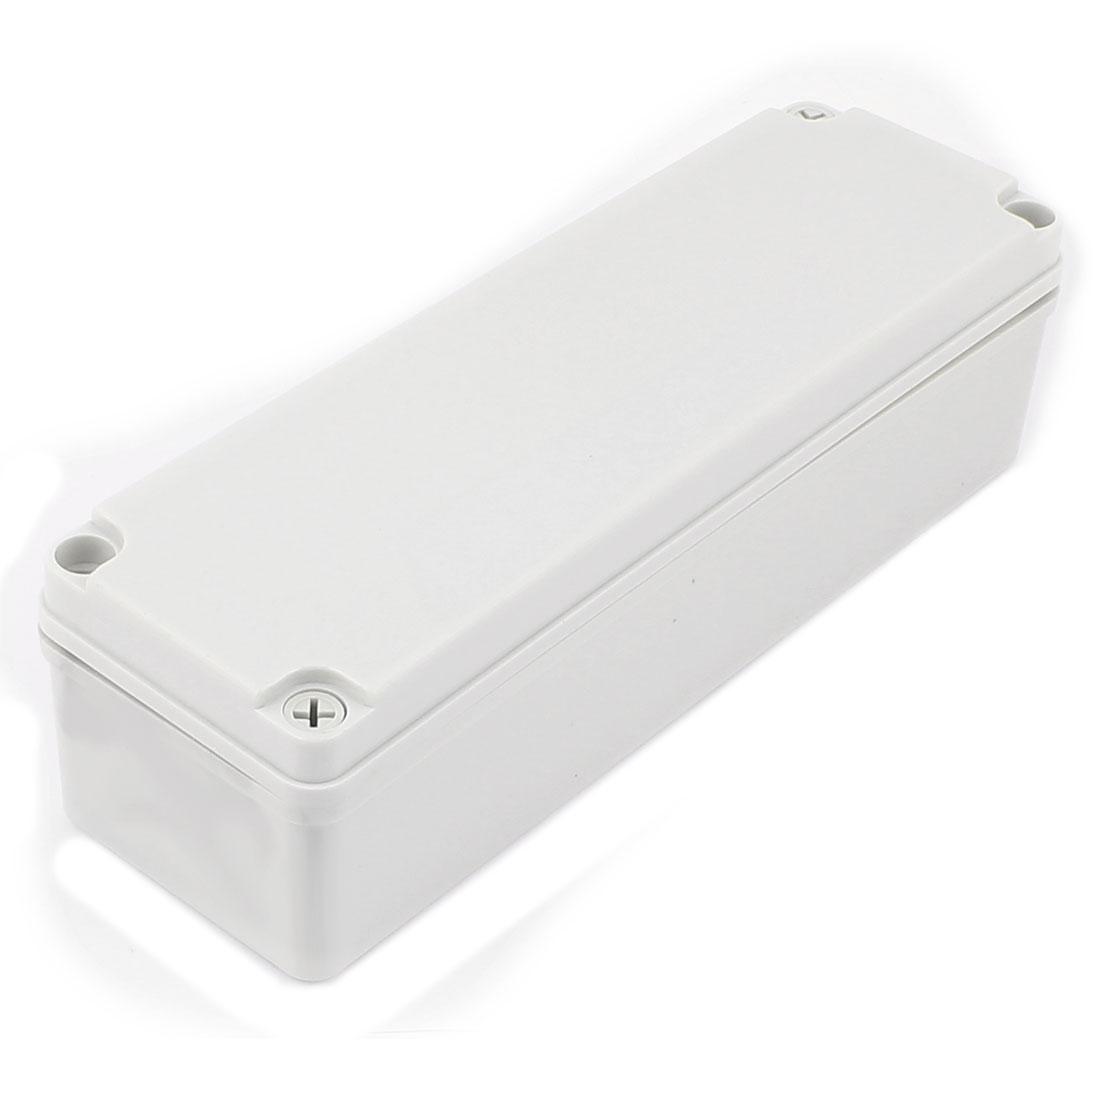 250mm x 80mm x 70mm Plastic Dustproof IP65 Sealed Enclosure Case DIY Junction Box